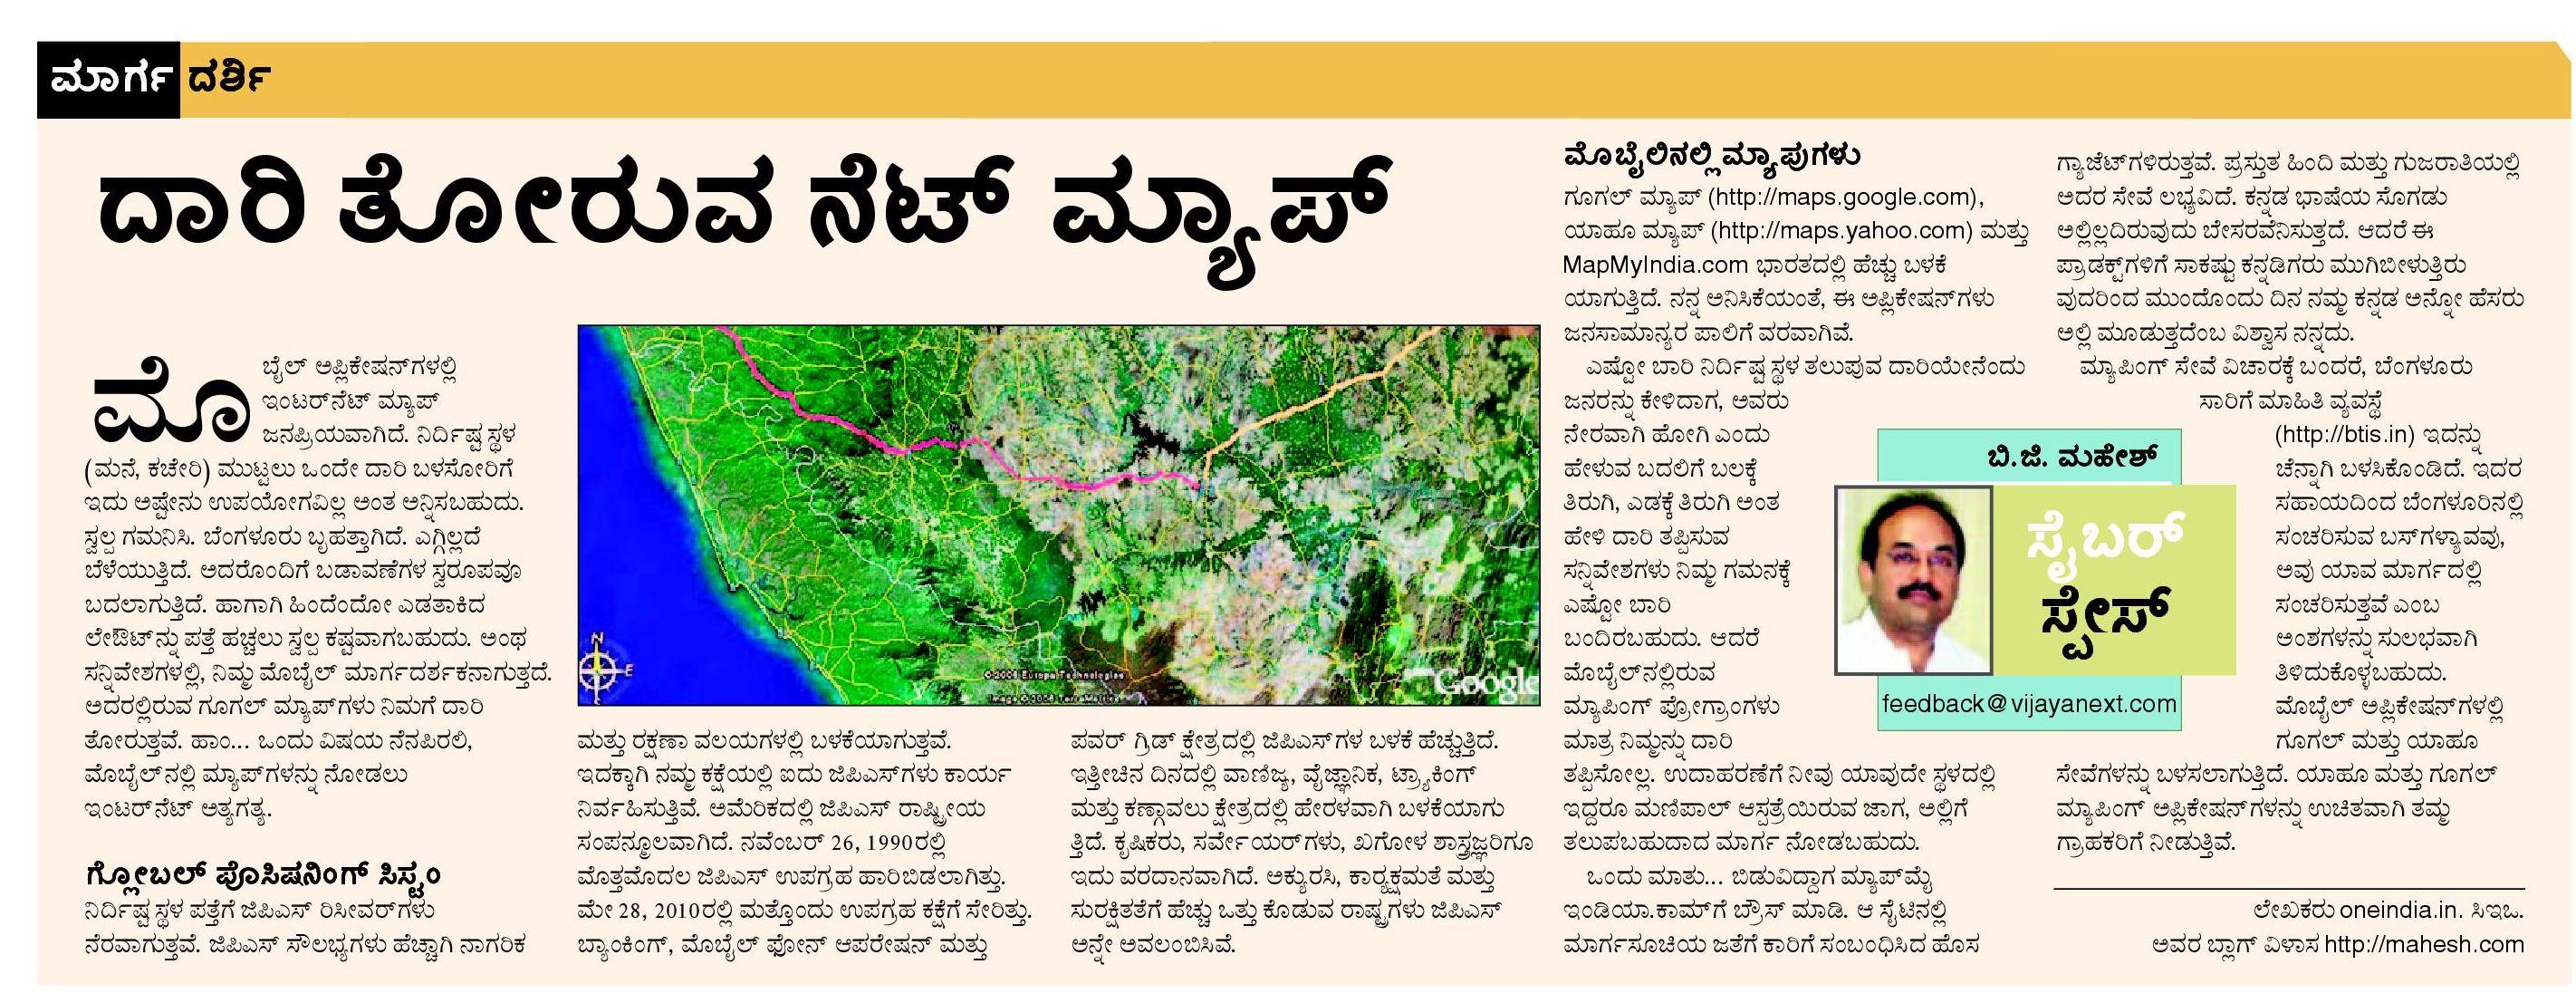 Vijay Next: Using maps online